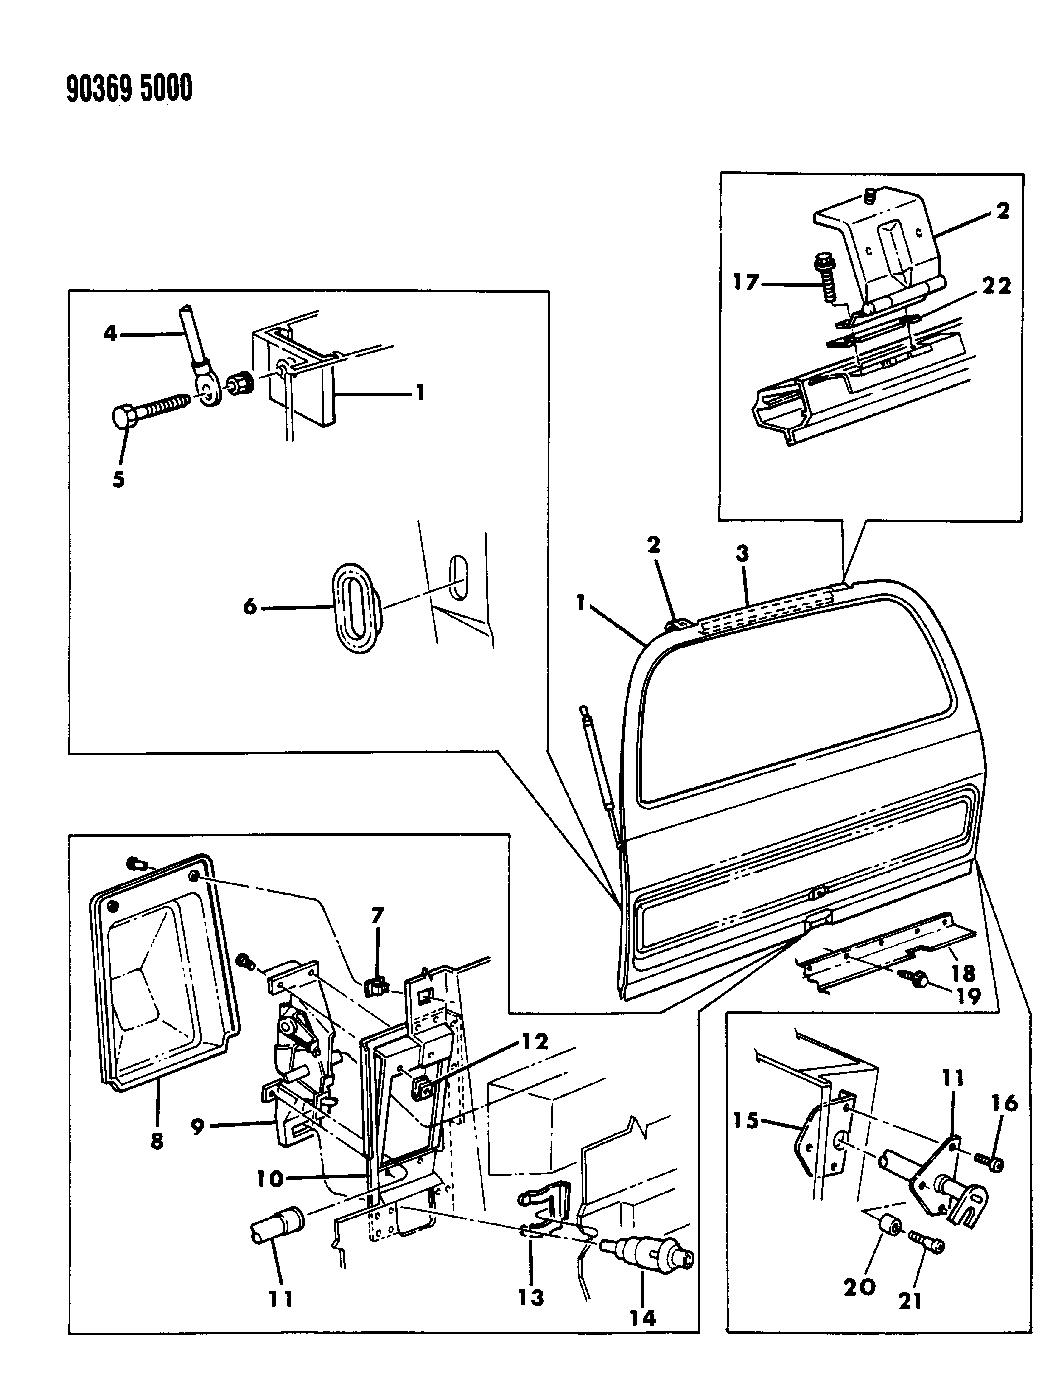 1991 dodge ramcharger hatch gate  u0026 attaching parts